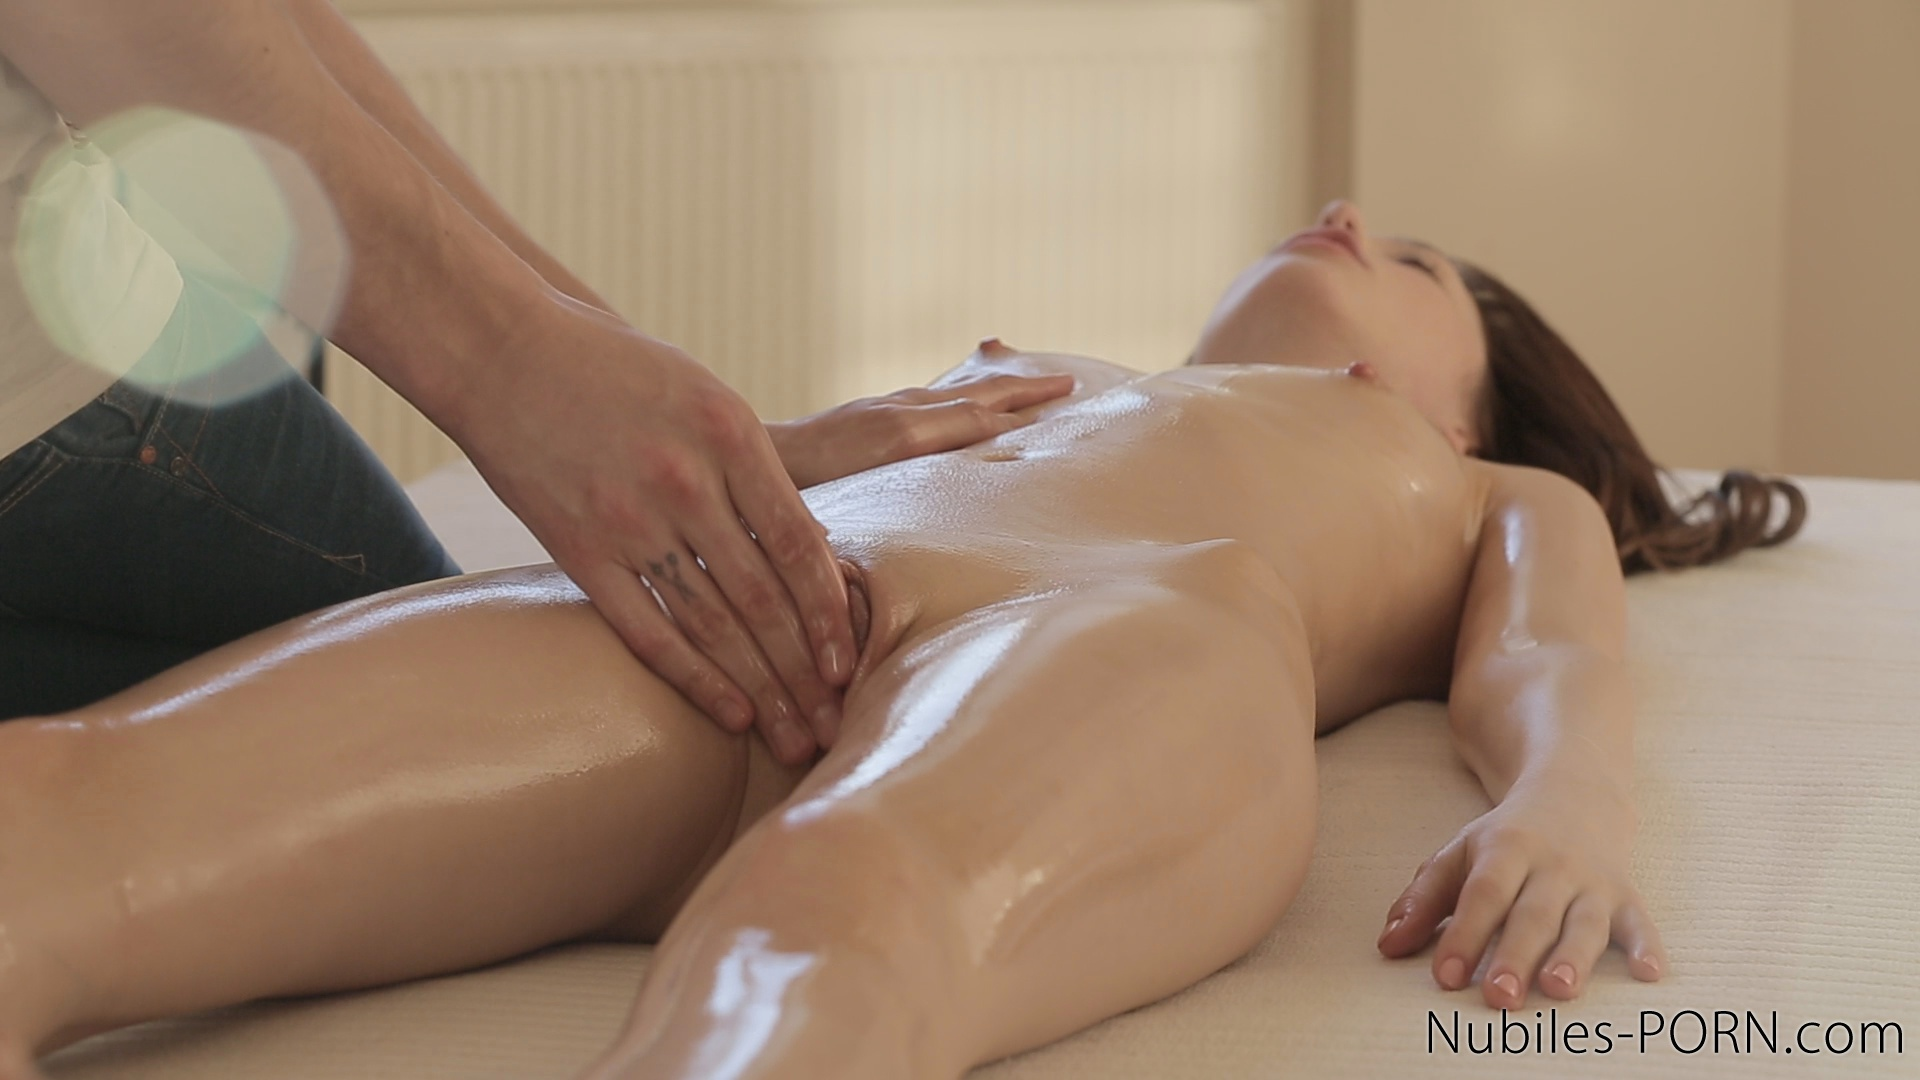 masages porn